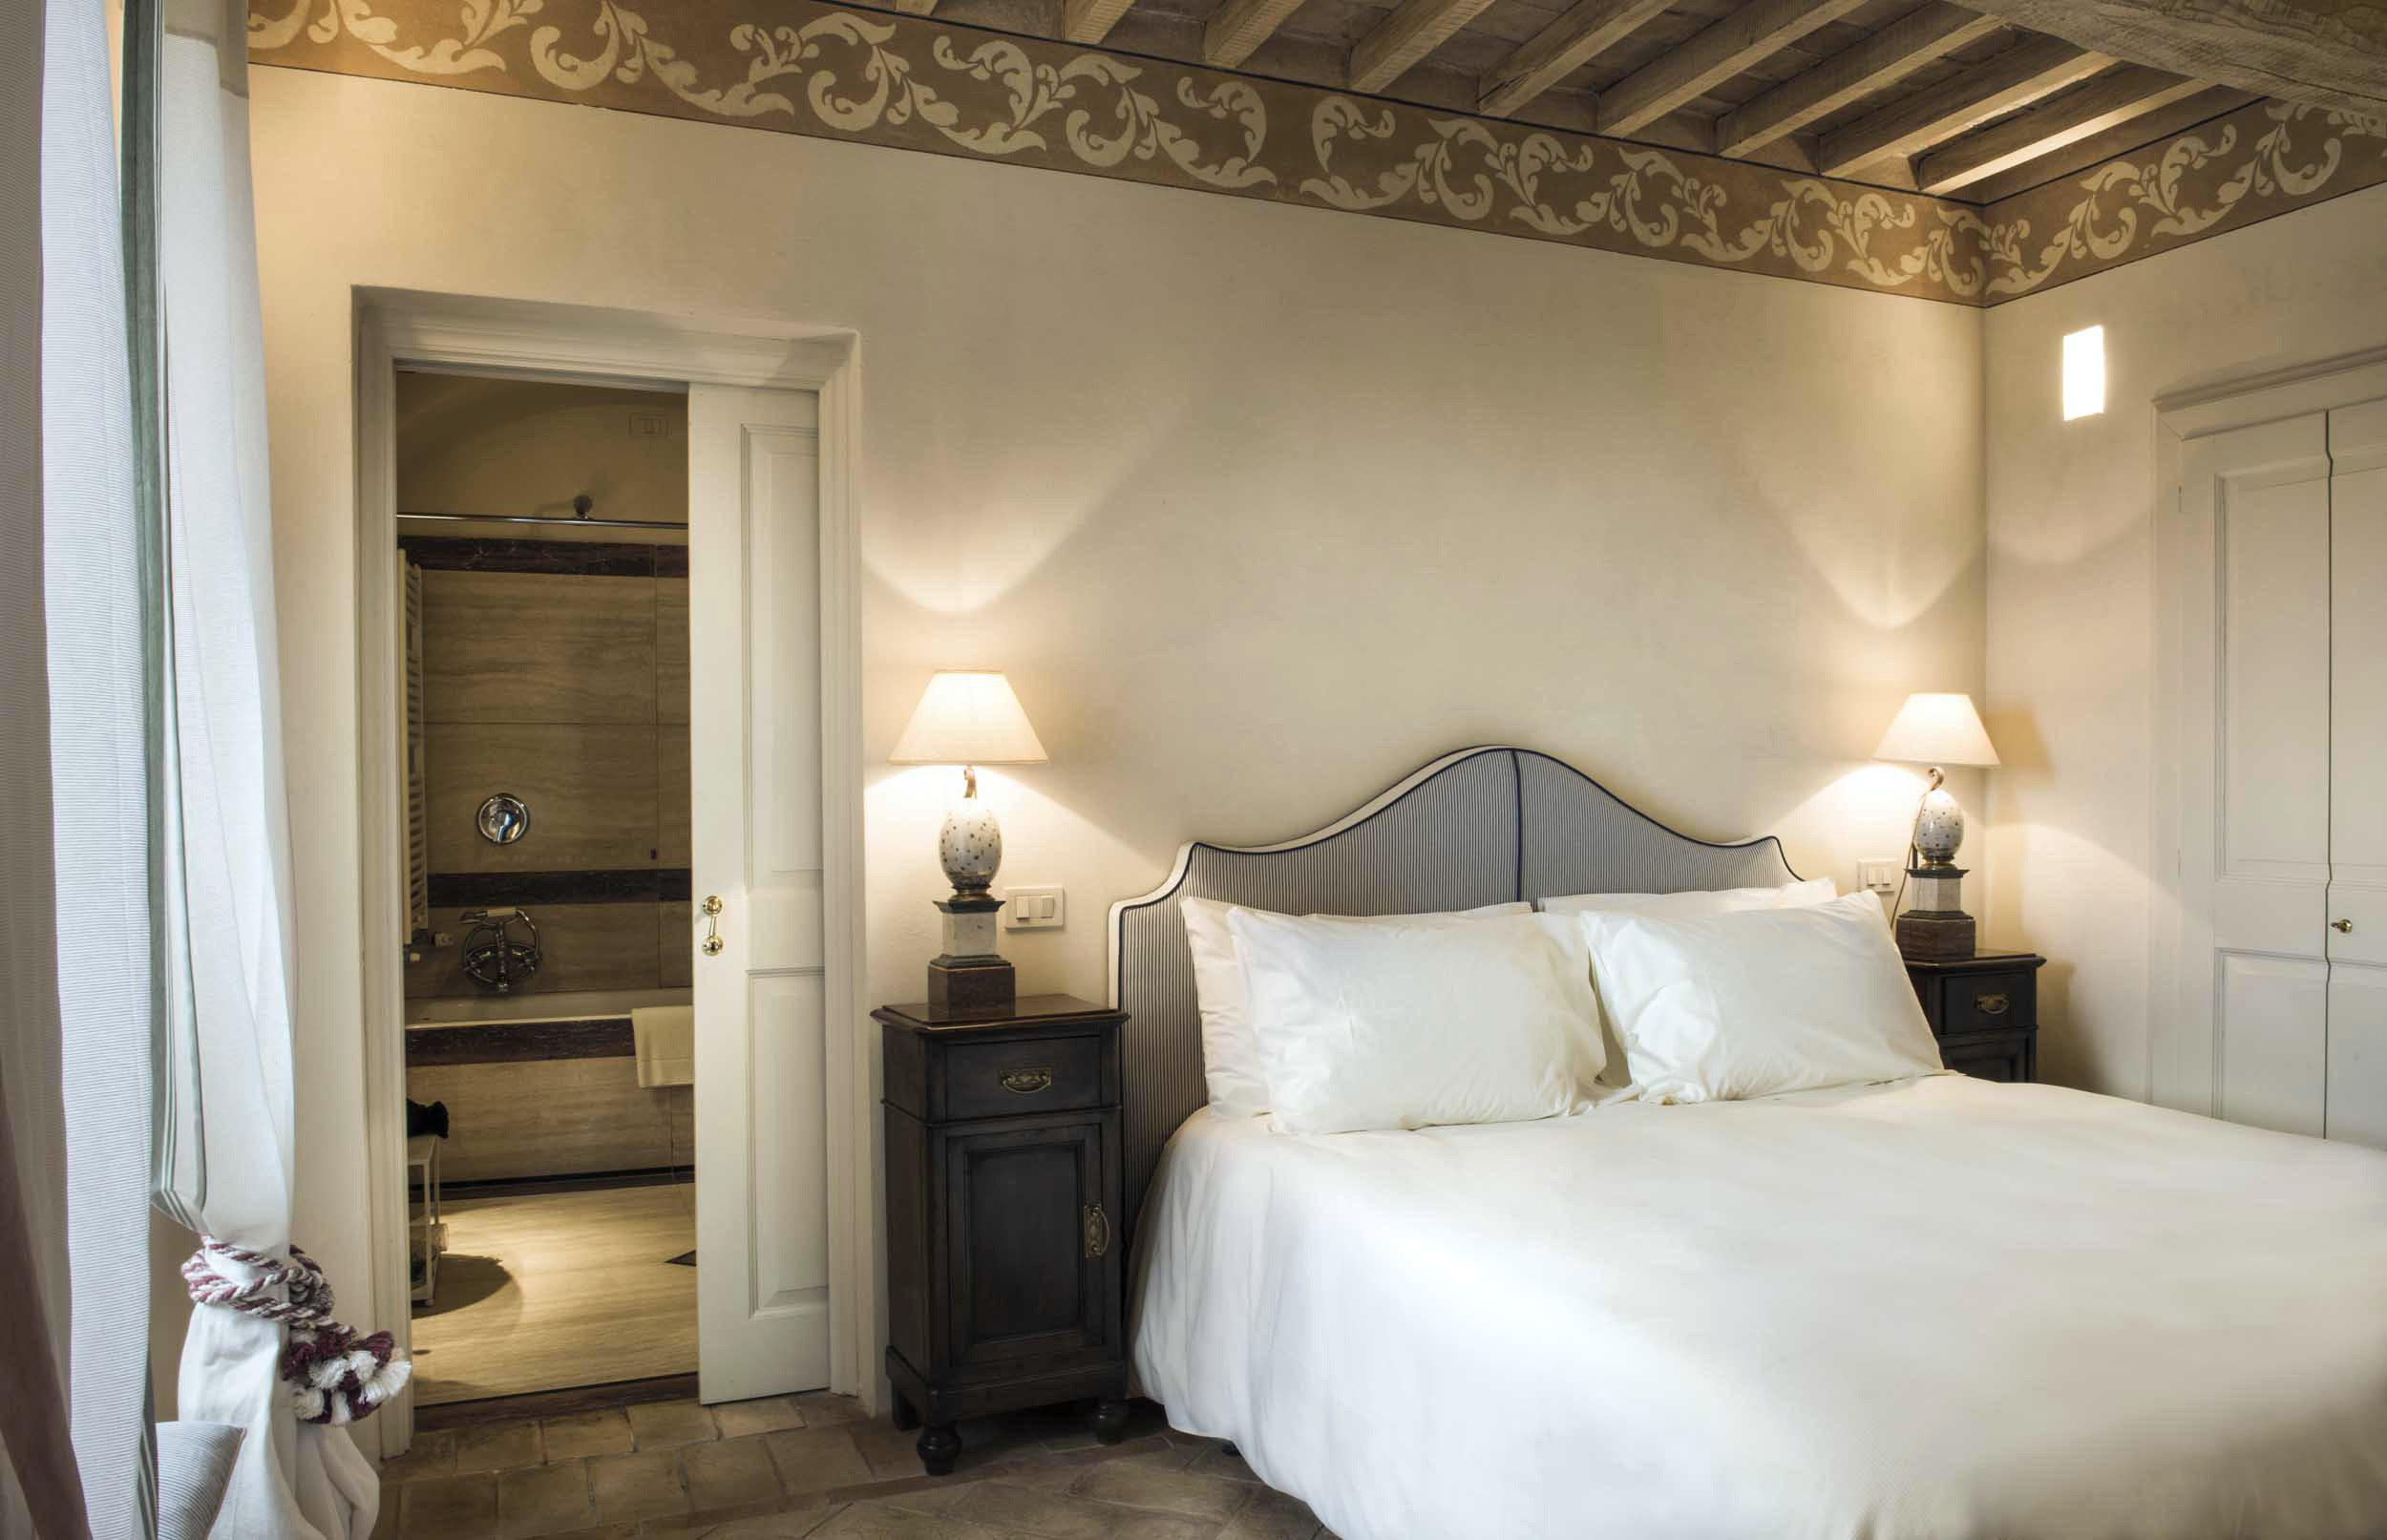 Bedroom Honeymoon Italy Luxury Romance Romantic Trip Ideas property Suite cottage tan